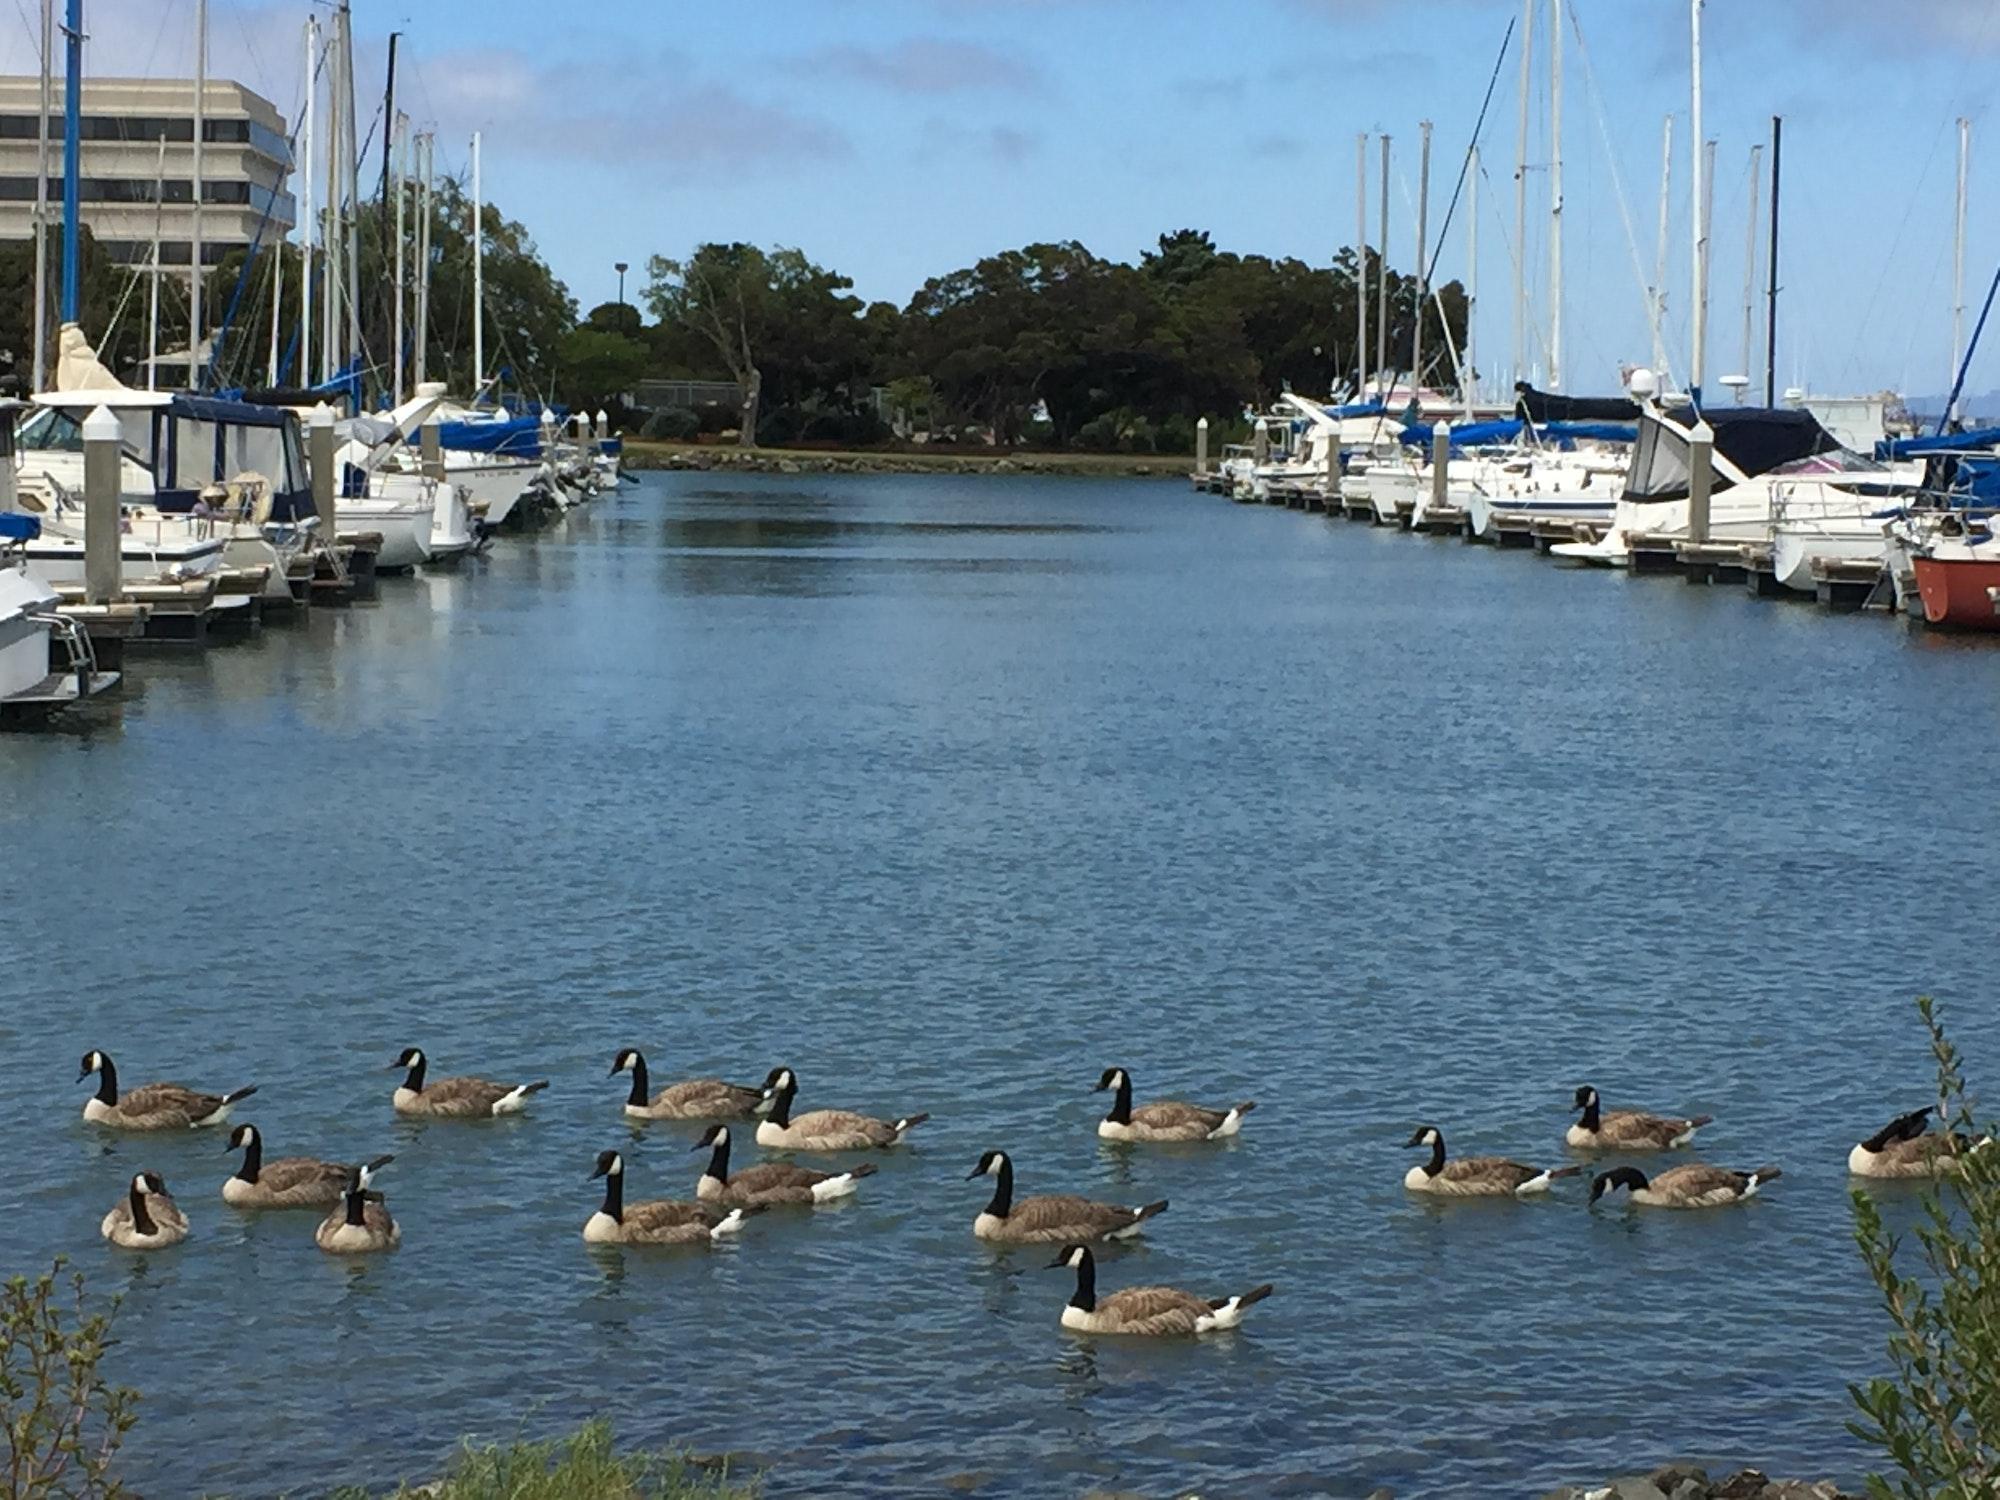 May contain: water, vessel, transportation, vehicle, watercraft, waterfront, marina, bird, animal, pier, port, and dock